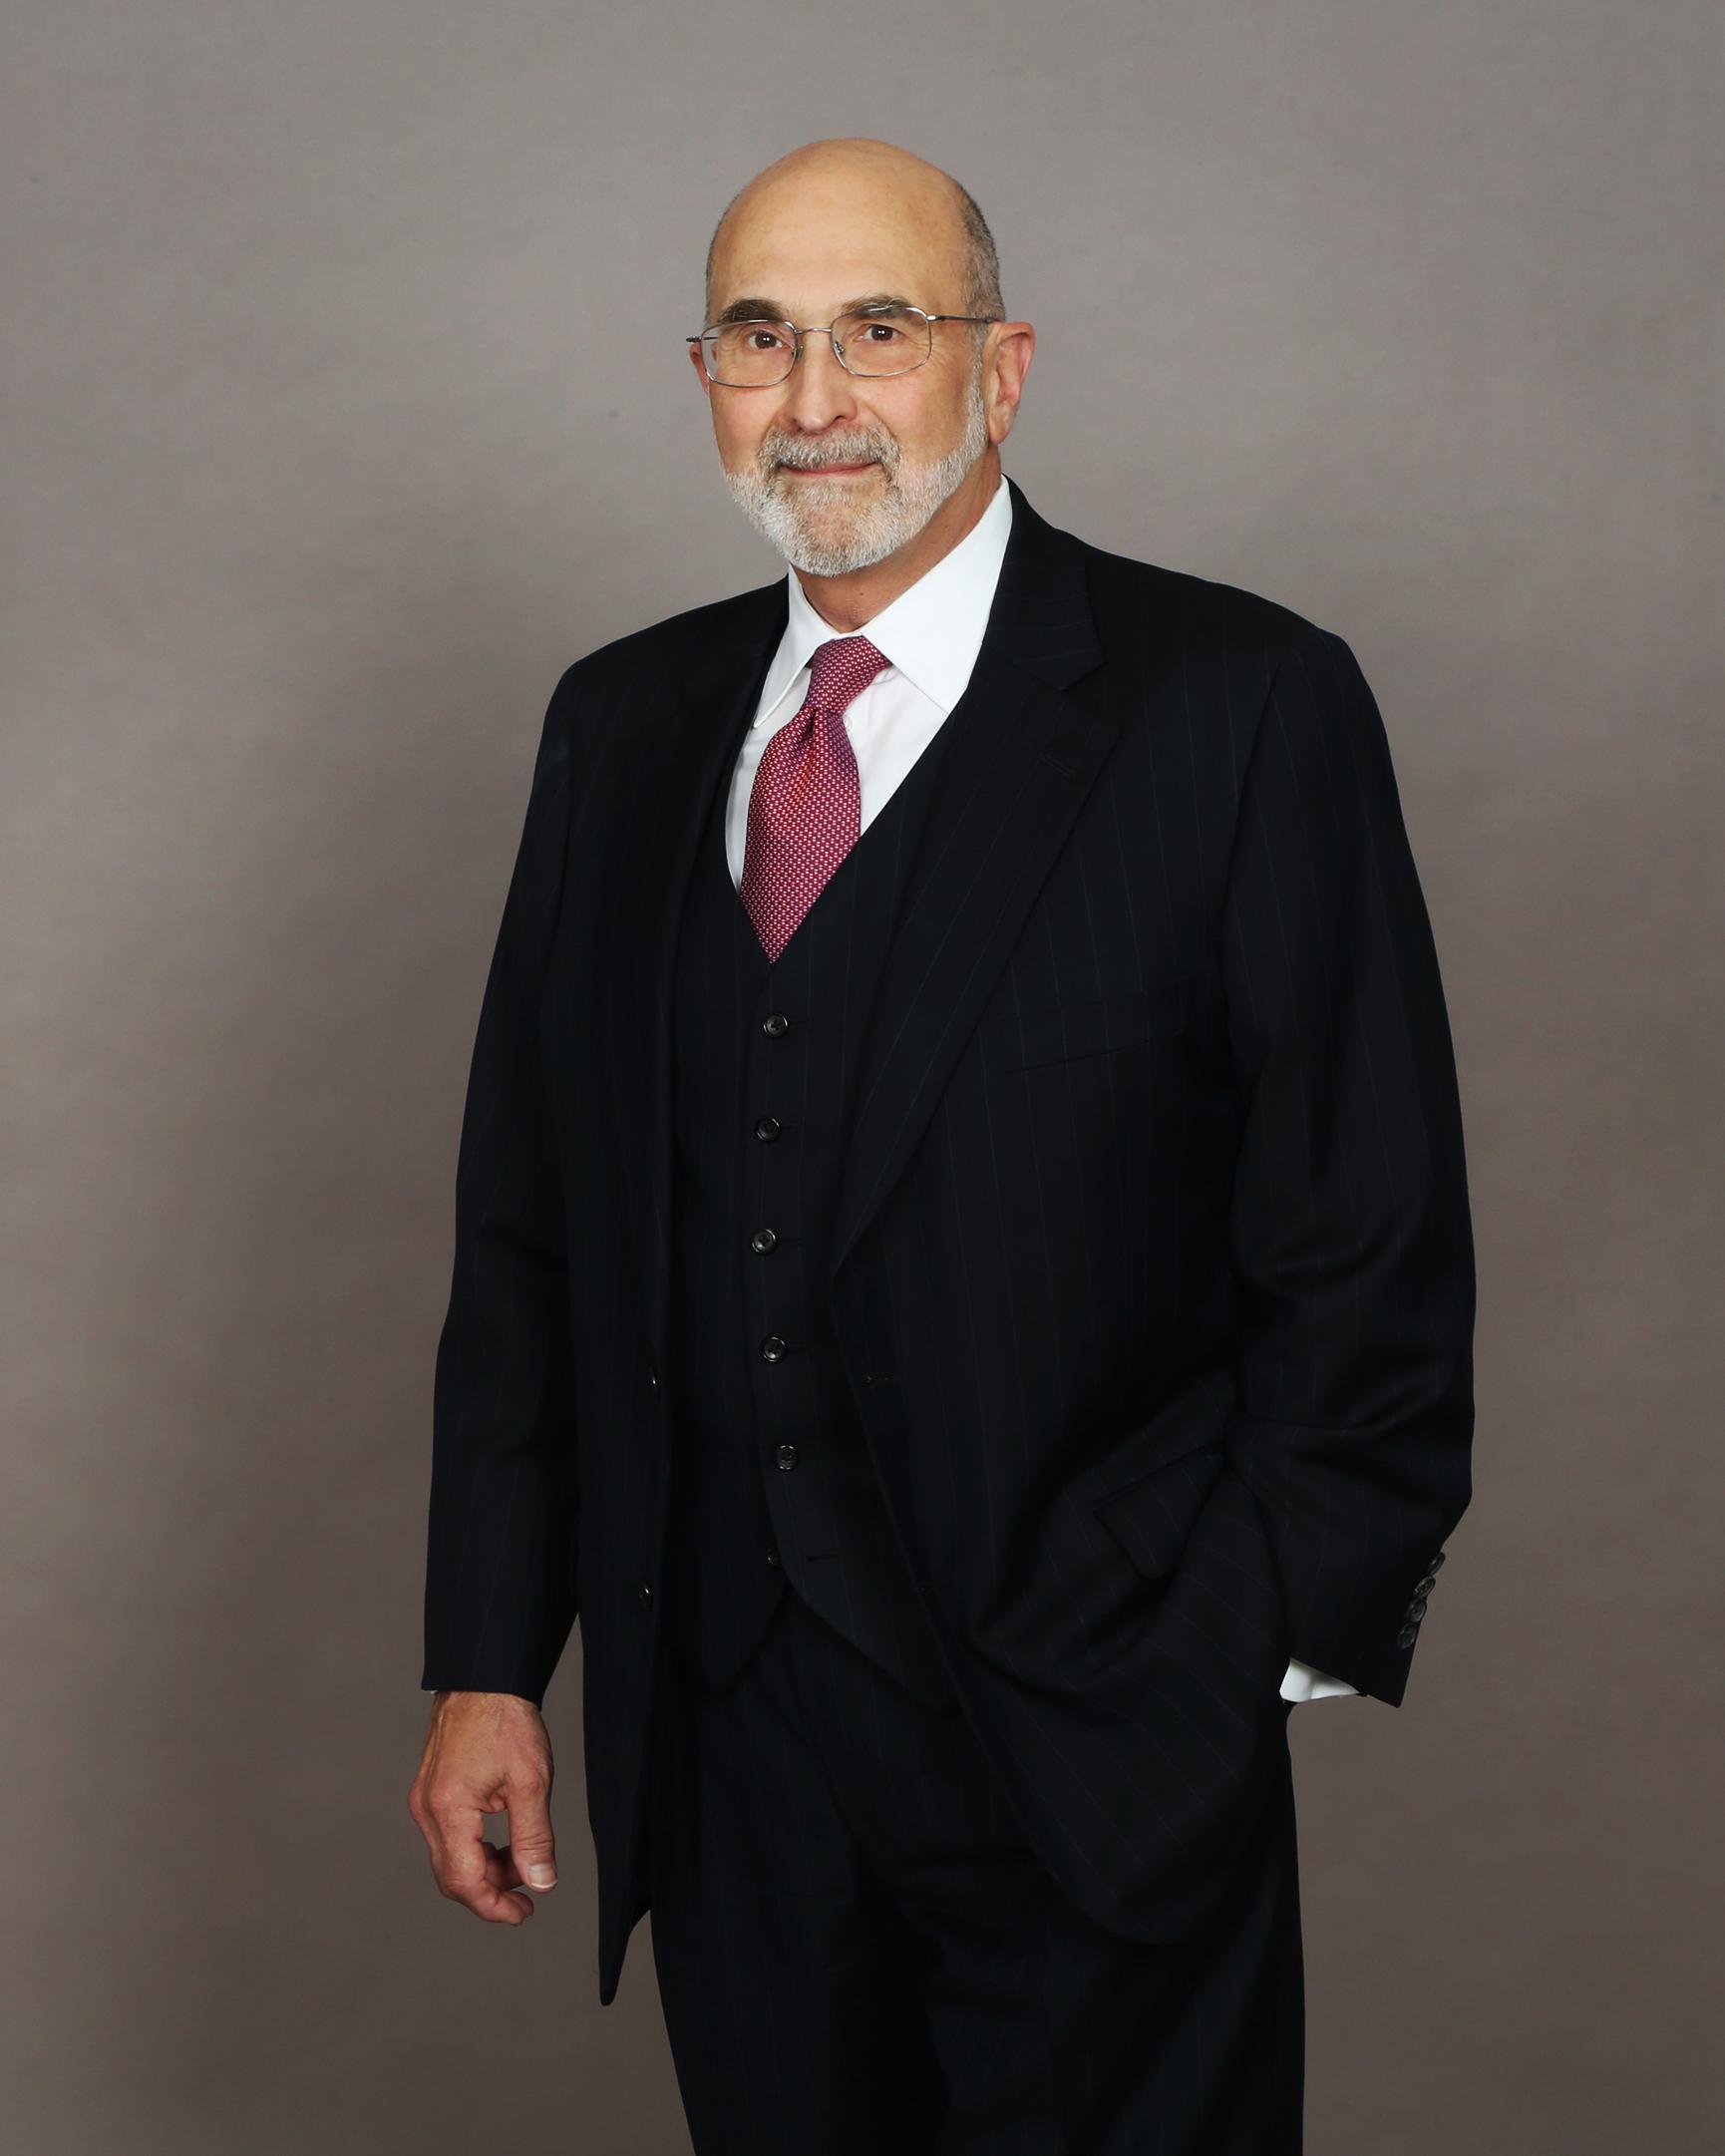 Joseph H. Spiegel PLLC